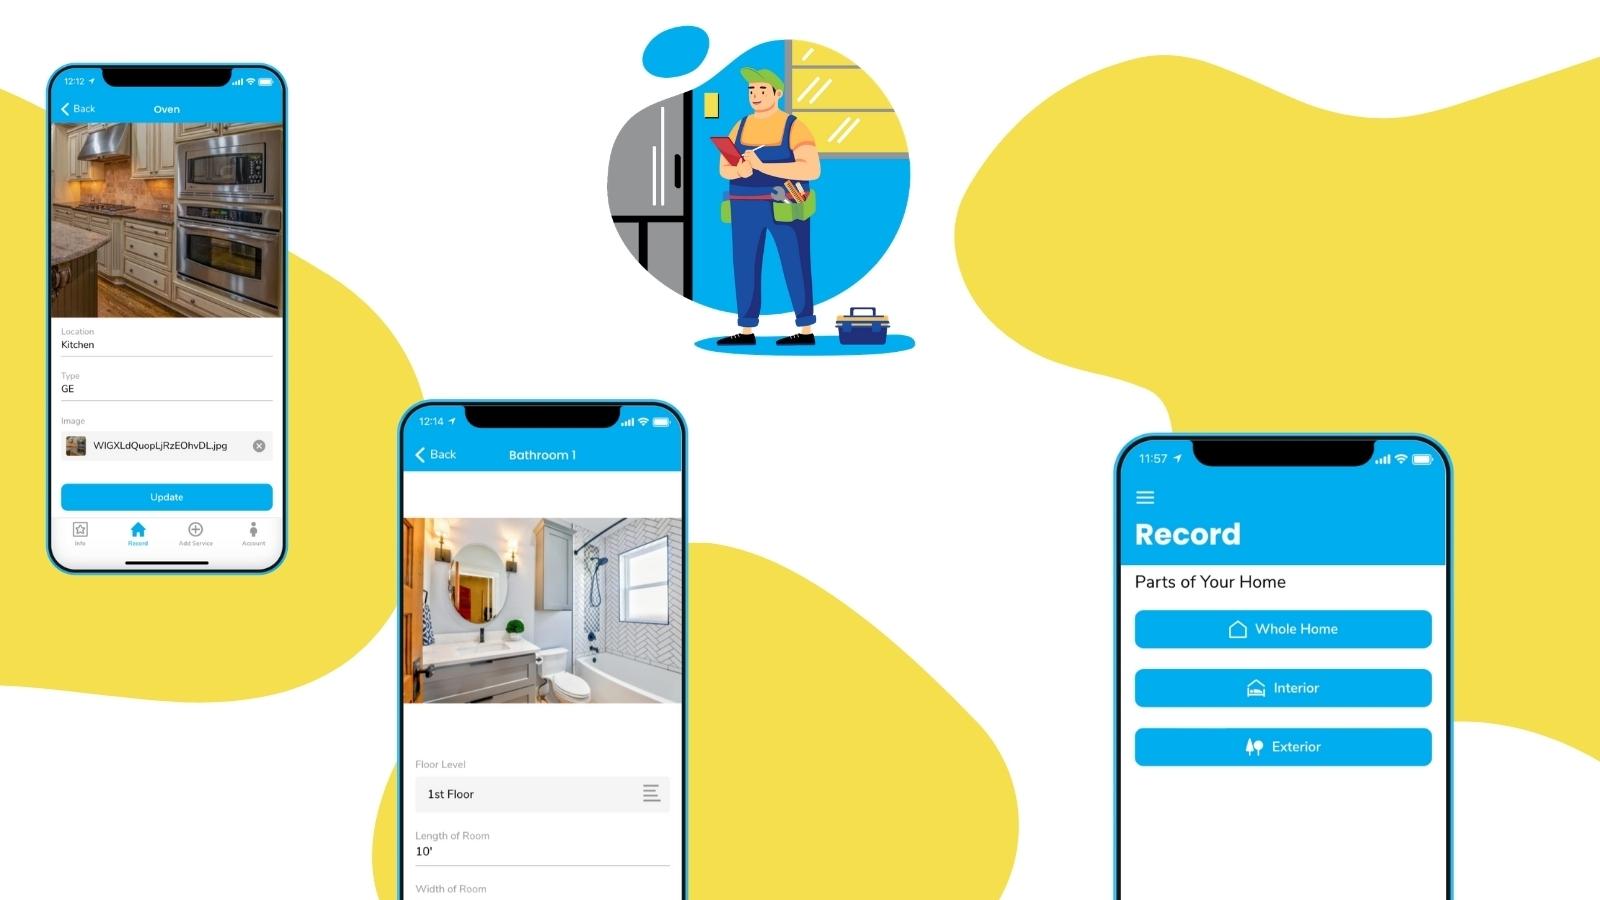 Digital Home Record